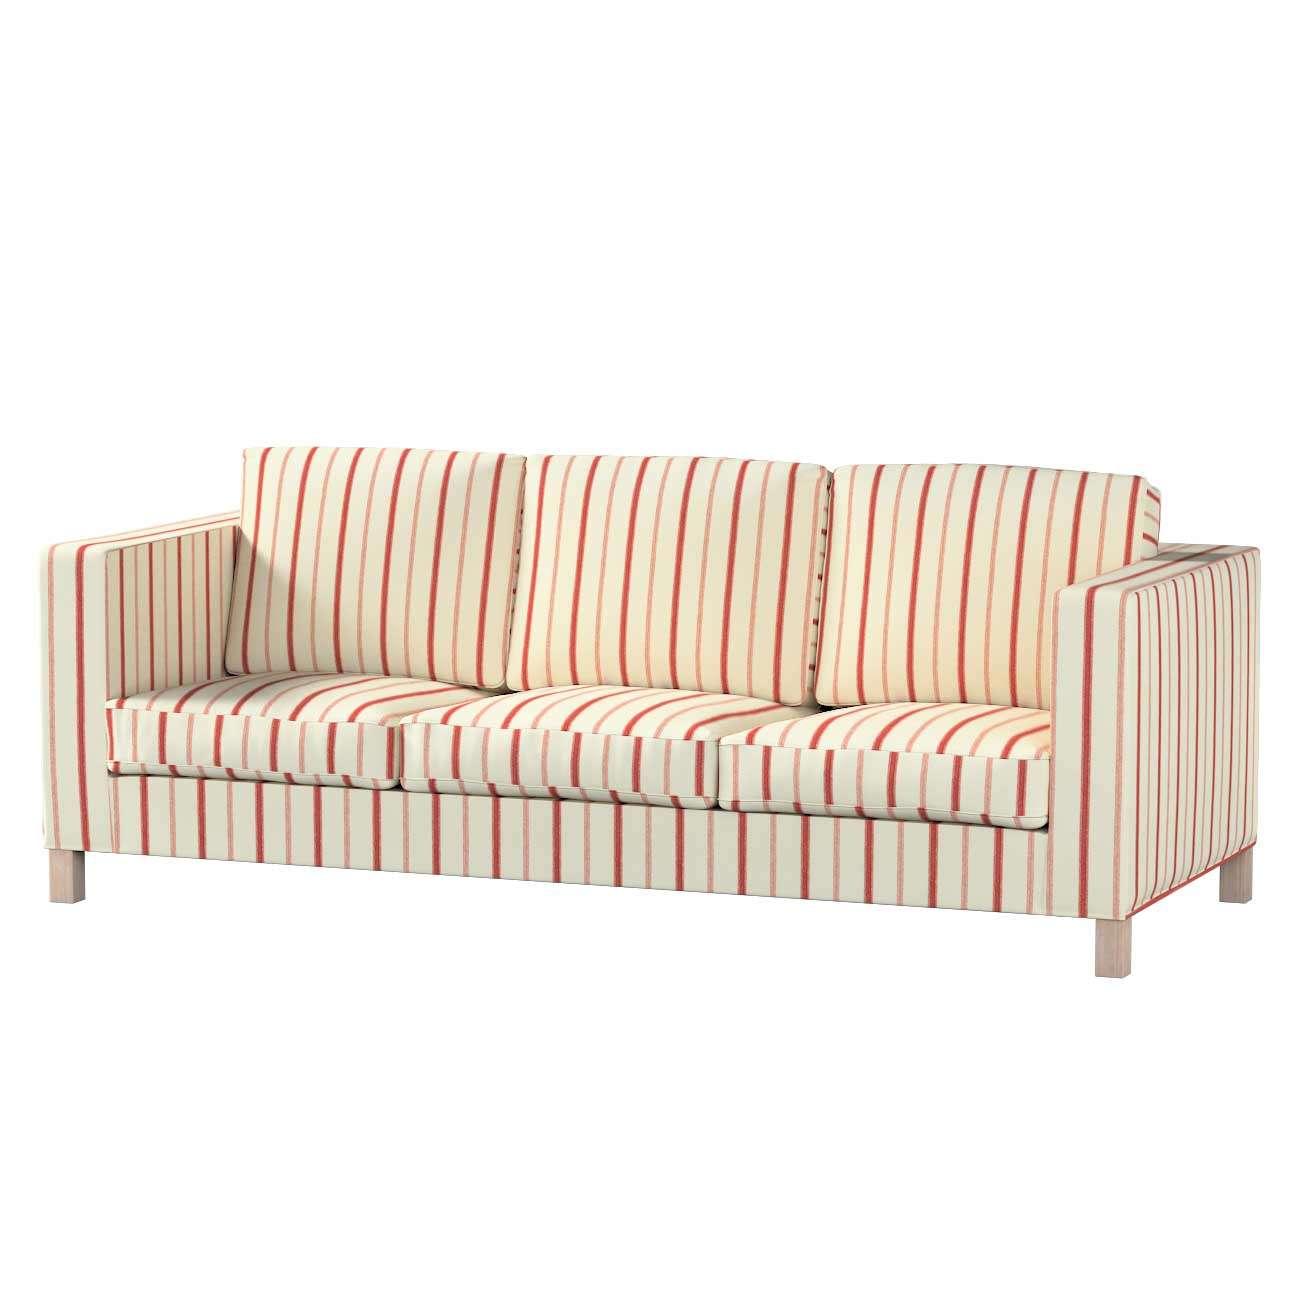 Karlanda 3-seater sofa cover  Karlanda 3-seat sofa in collection Avinon, fabric: 129-15